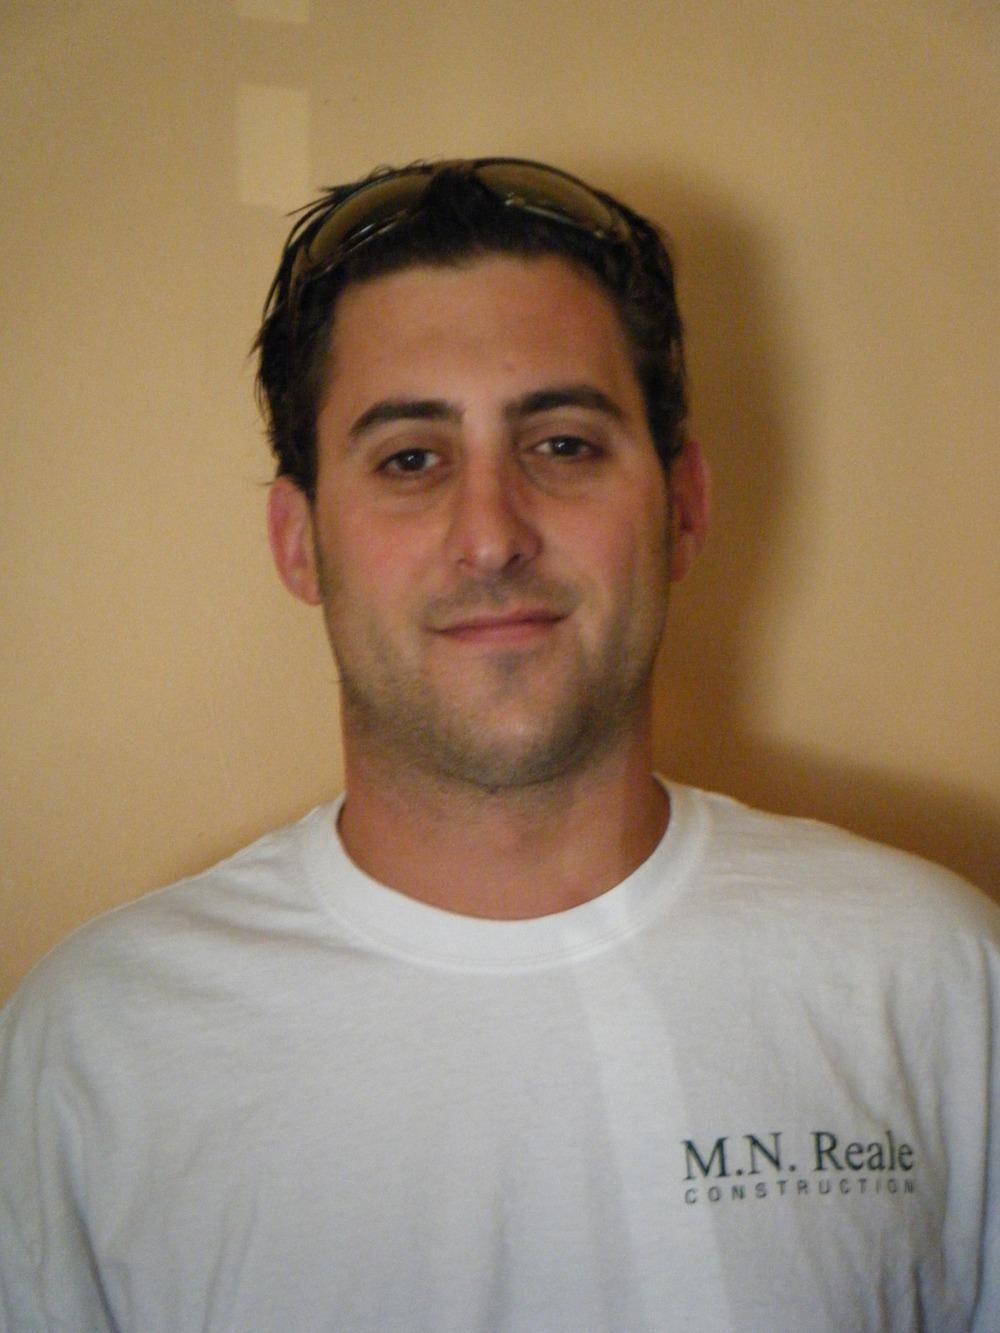 Matt Reale<br>Construction Contractor